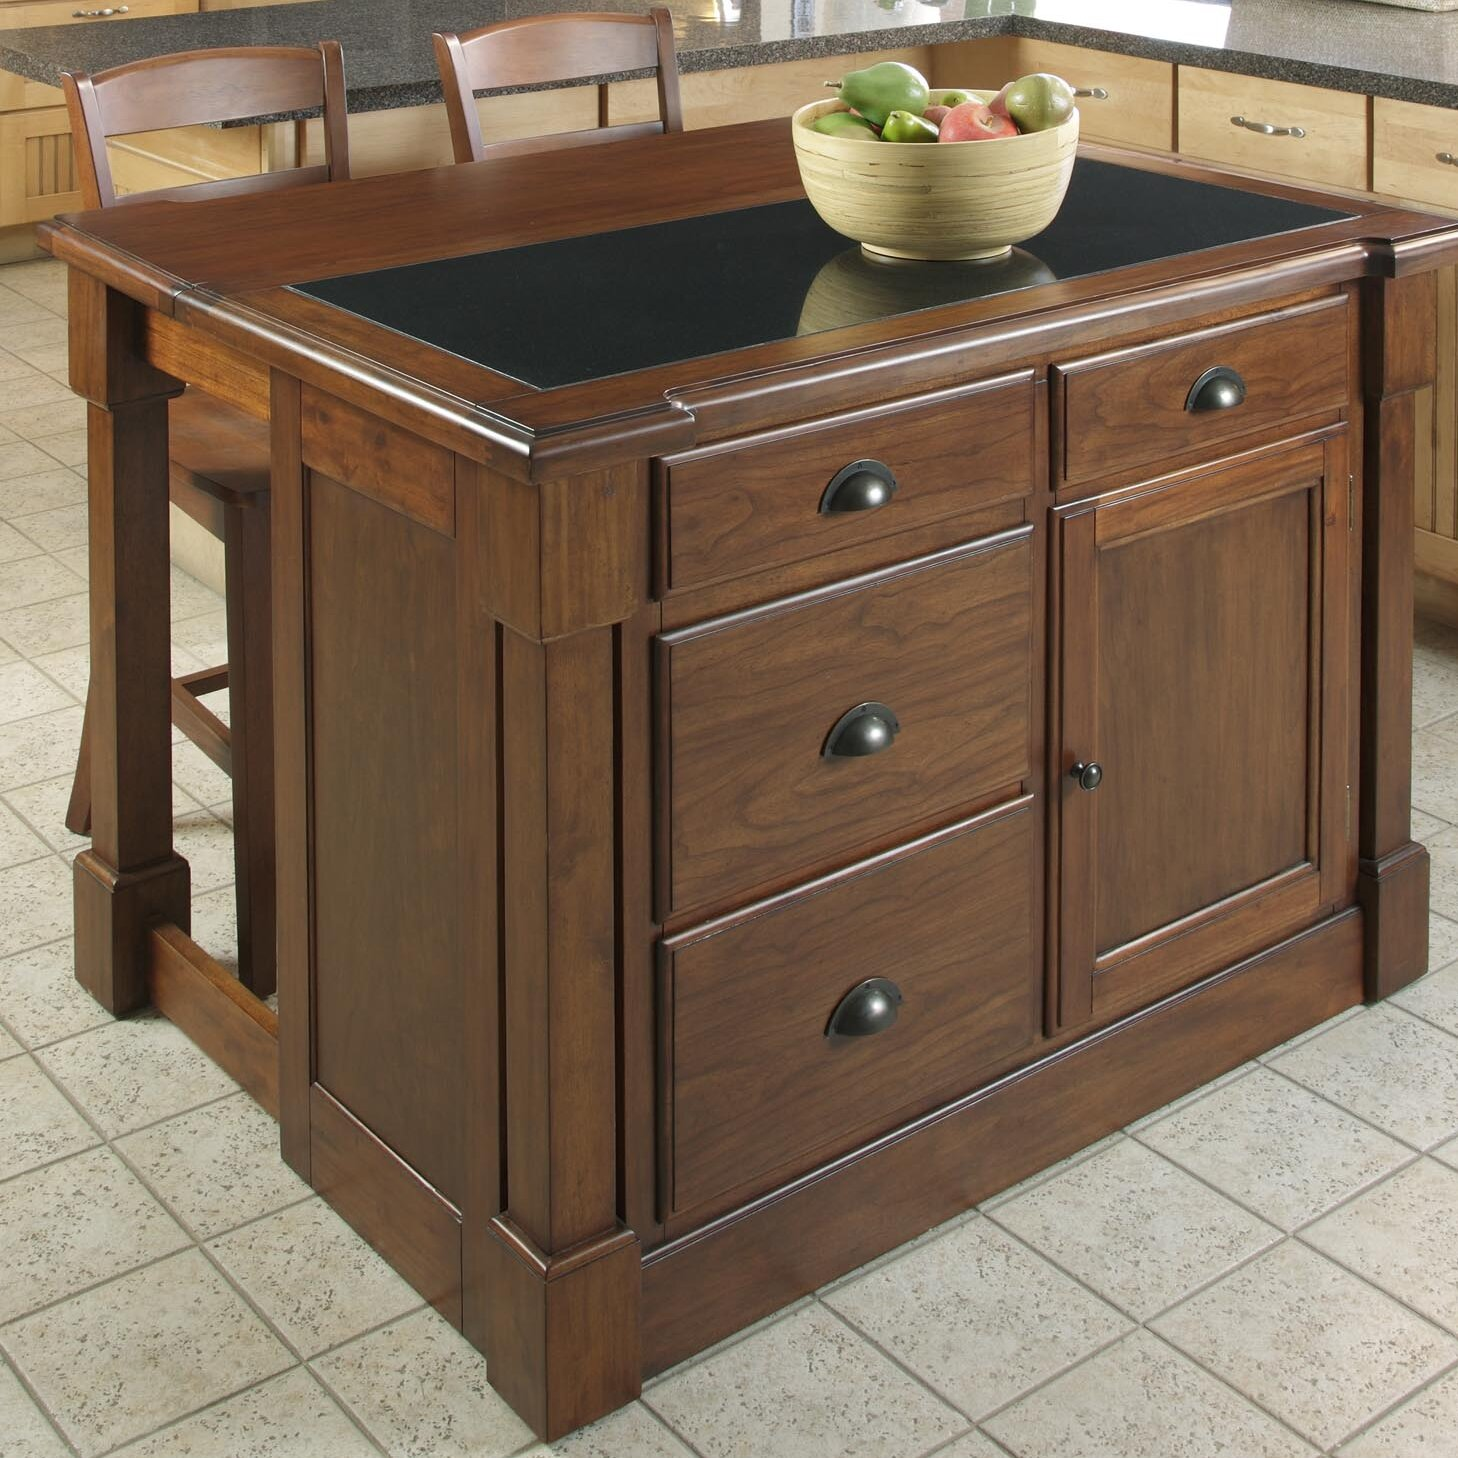 wayfair kitchen island design ideas   a1houston